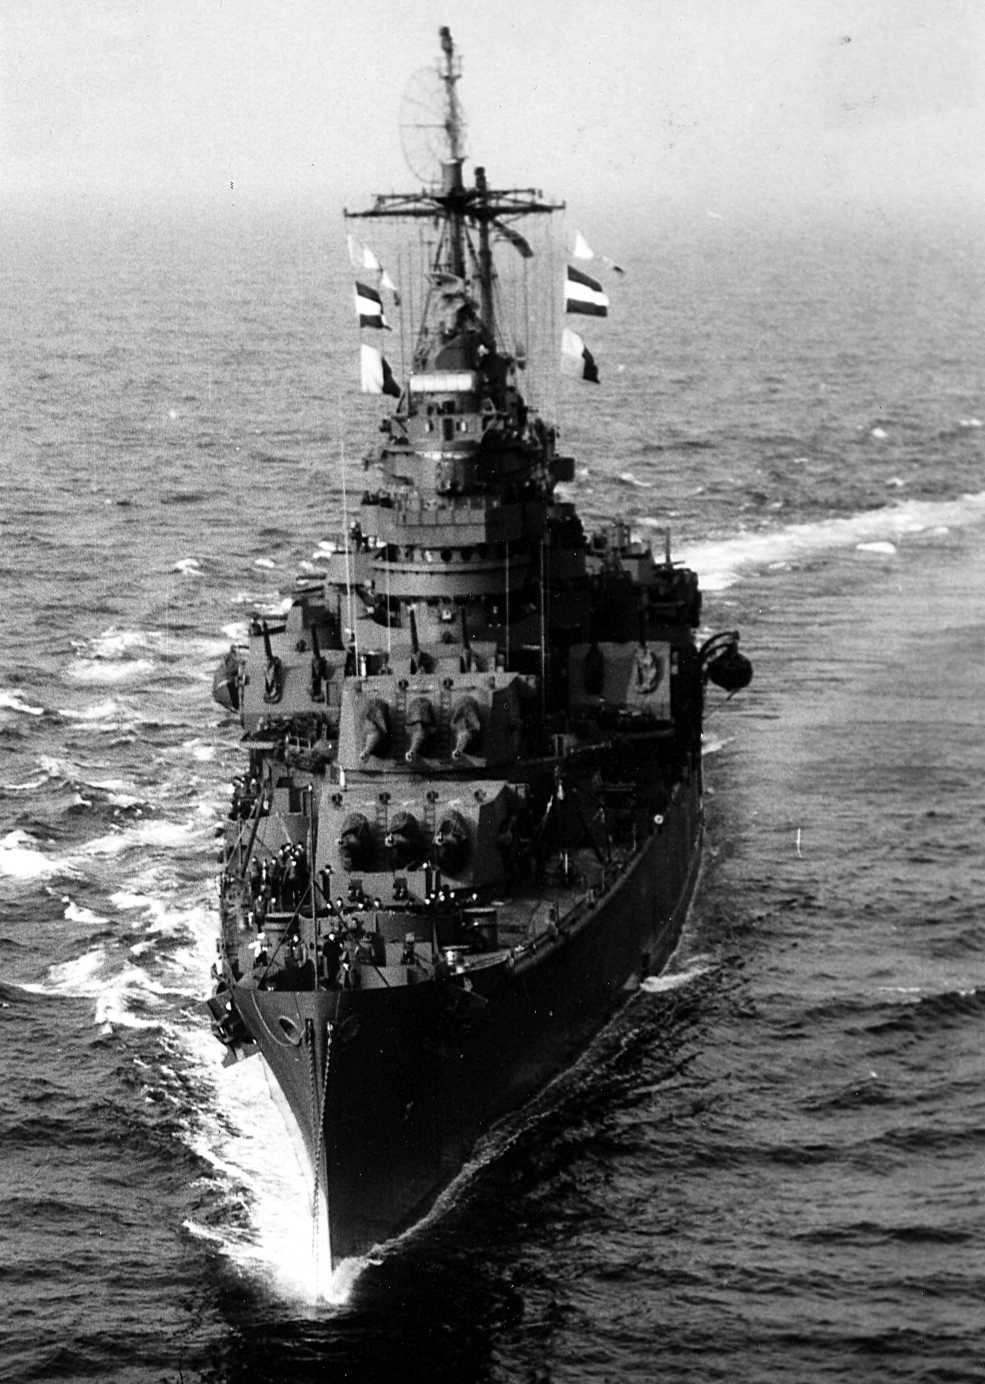 USS Saint Paul (CA-73) underway in Massachusetts Bay, Massachusetts, March 1945.